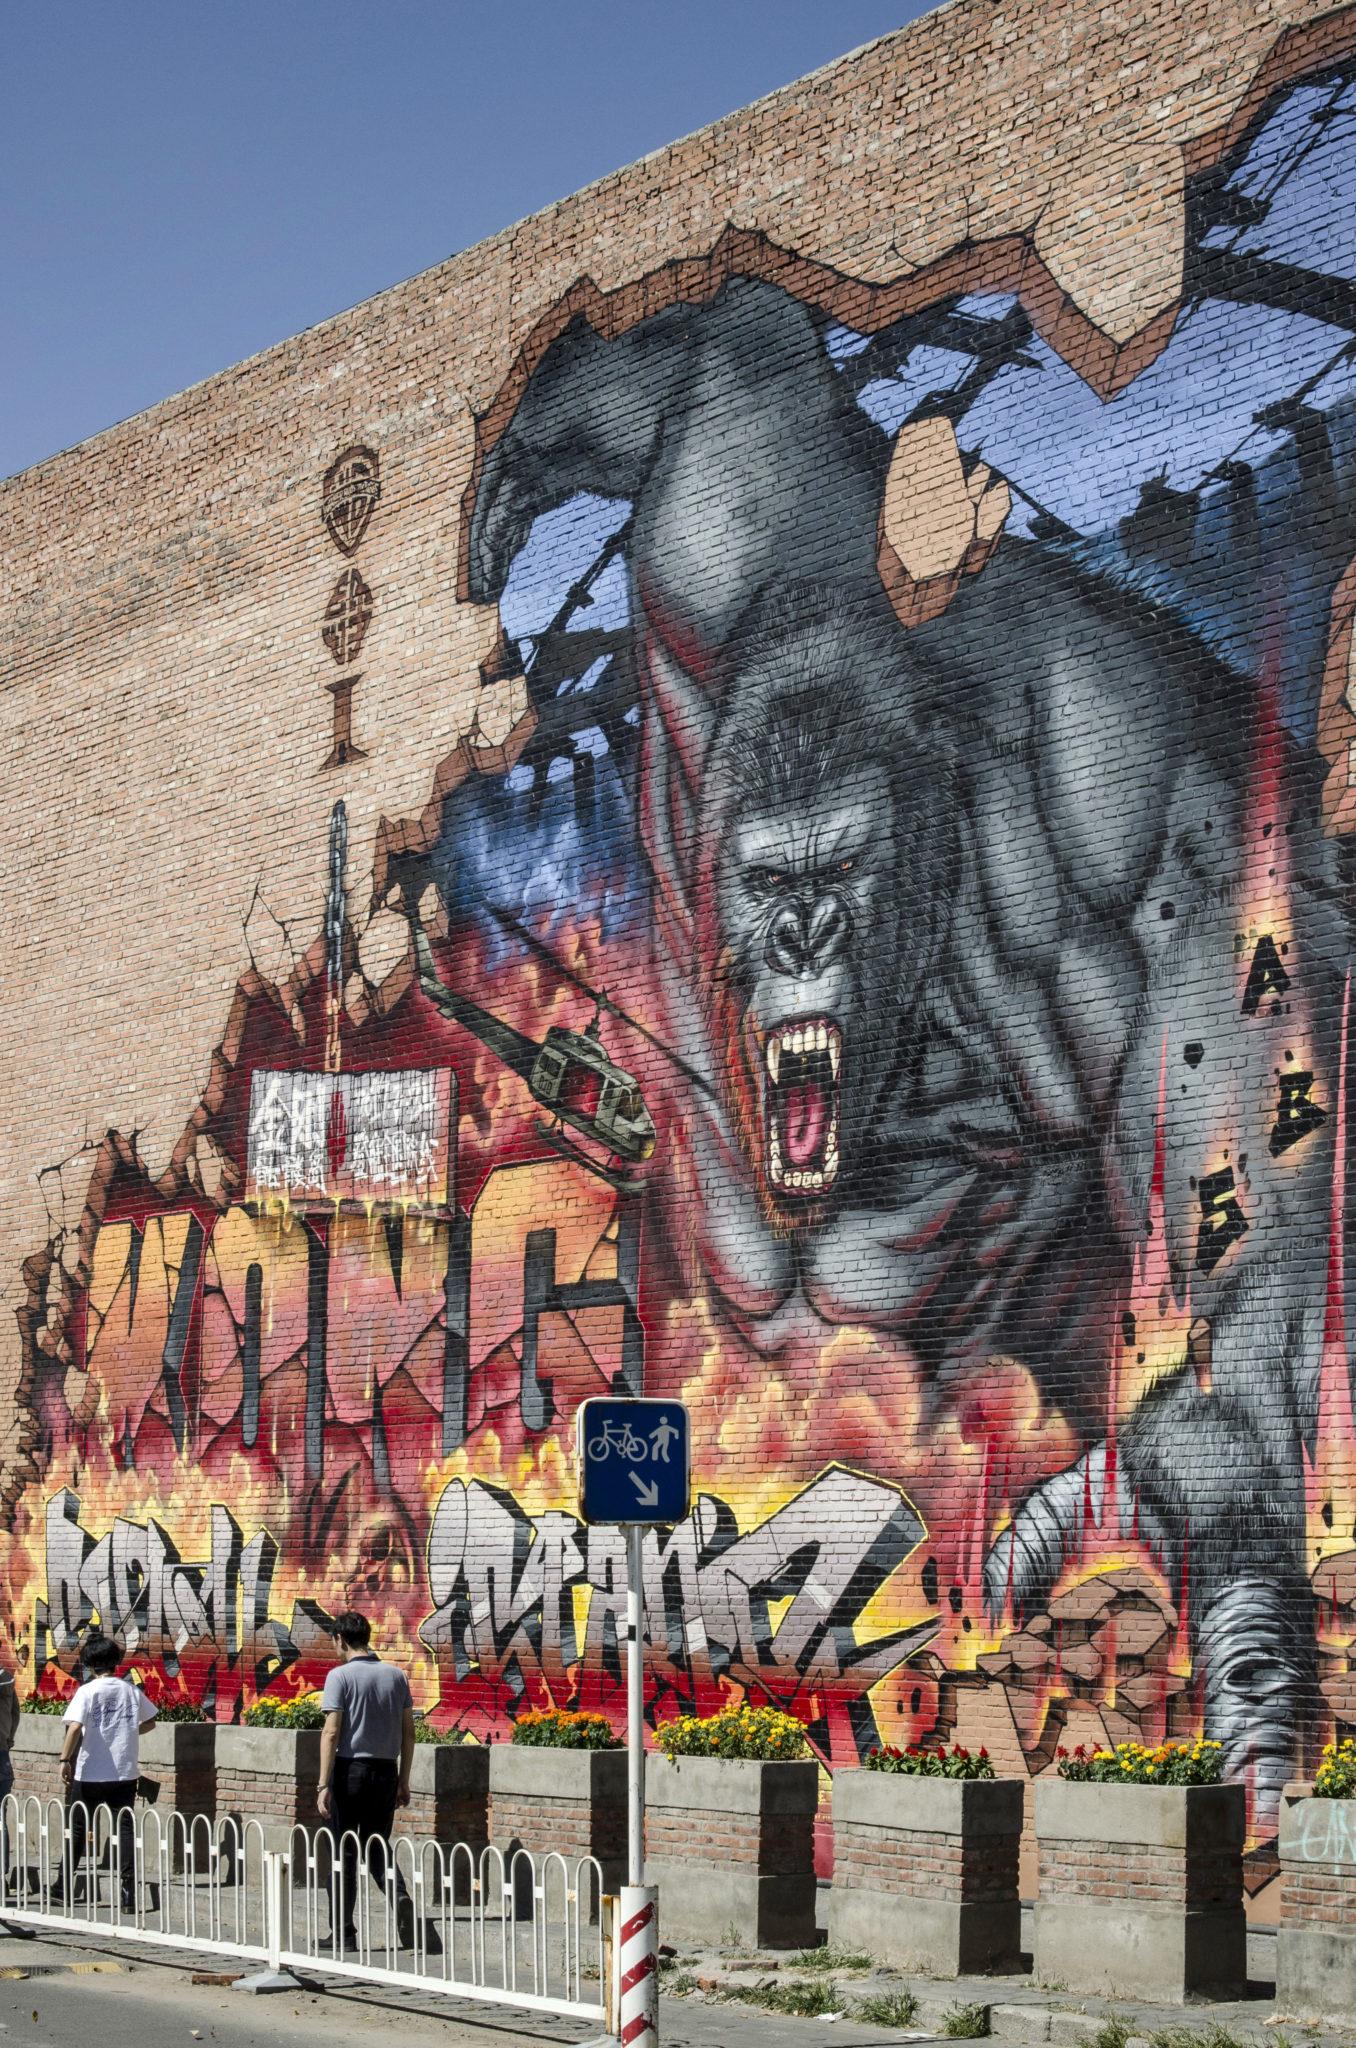 Das Gorilla Mural im 798 Art District in Beijing